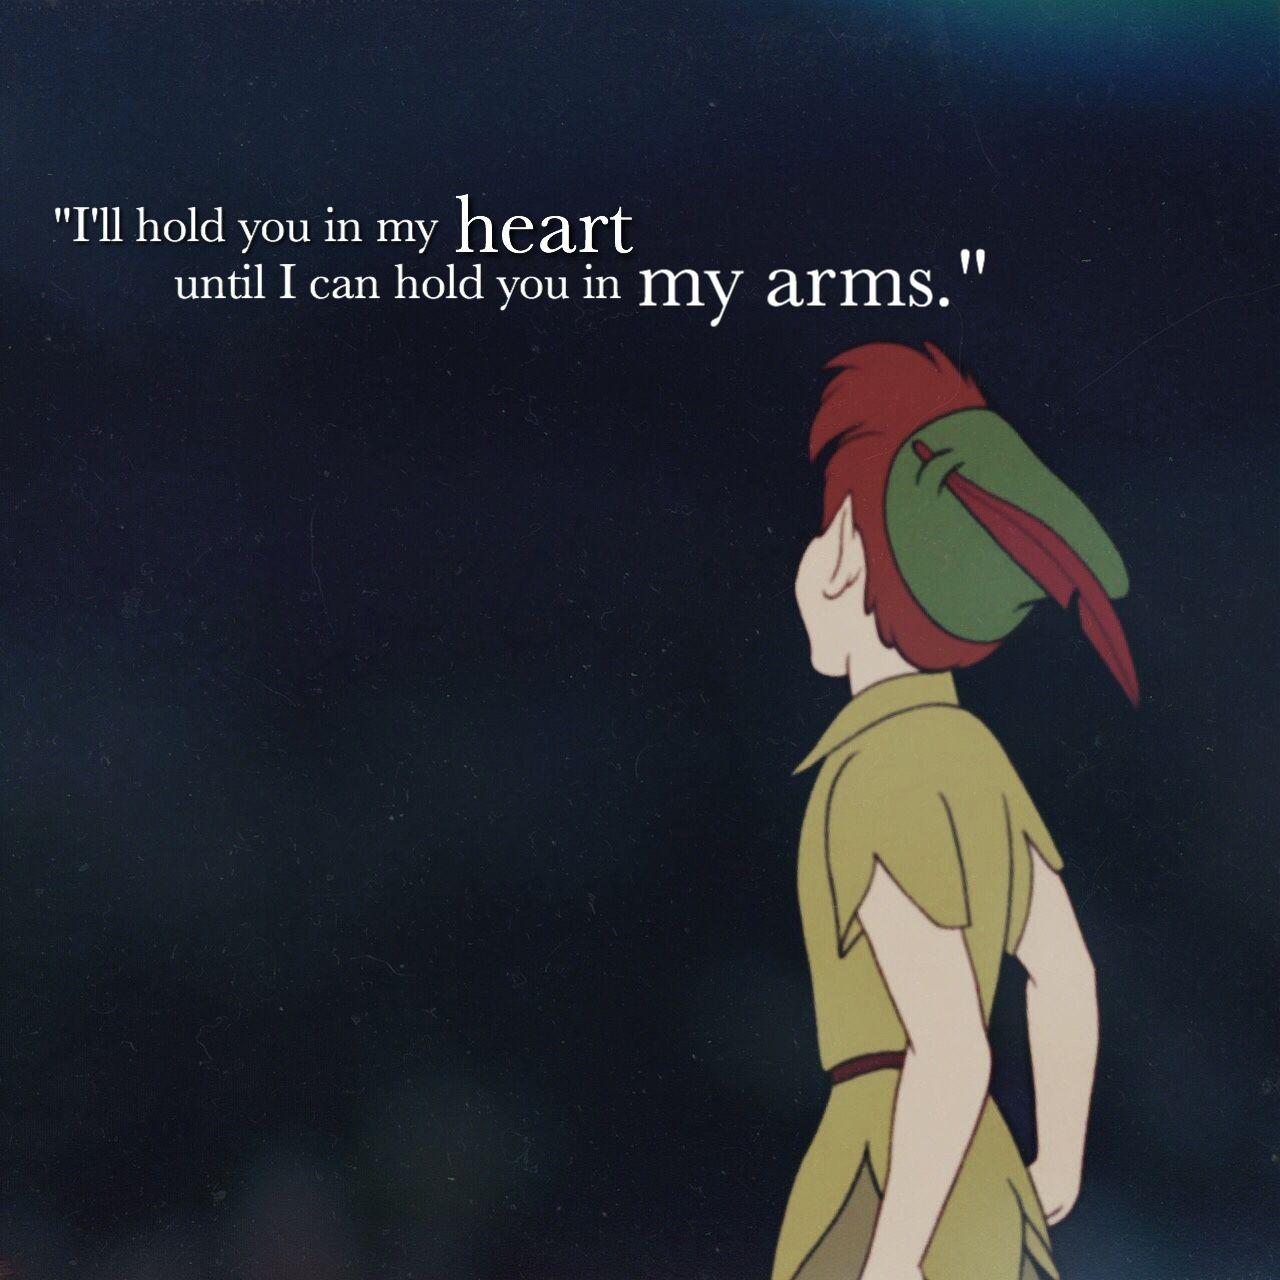 Peter Pan Tumblr Disney Quotes Cute Quotes Peter Pan Tumblr